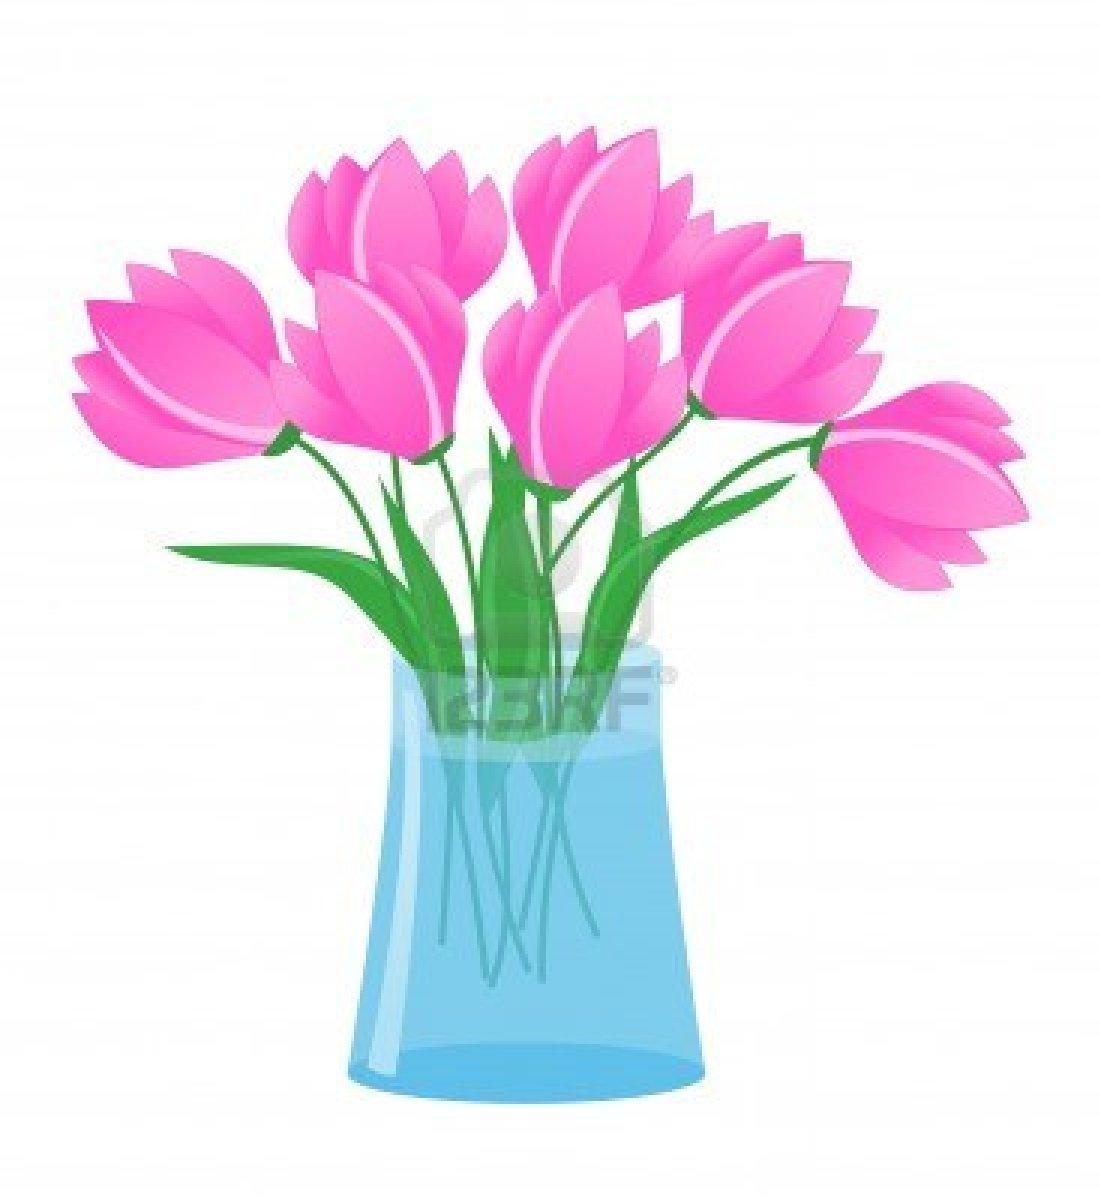 Flower vase clipart free download best flower vase clipart on 1101x1200 flower vase clipart mightylinksfo